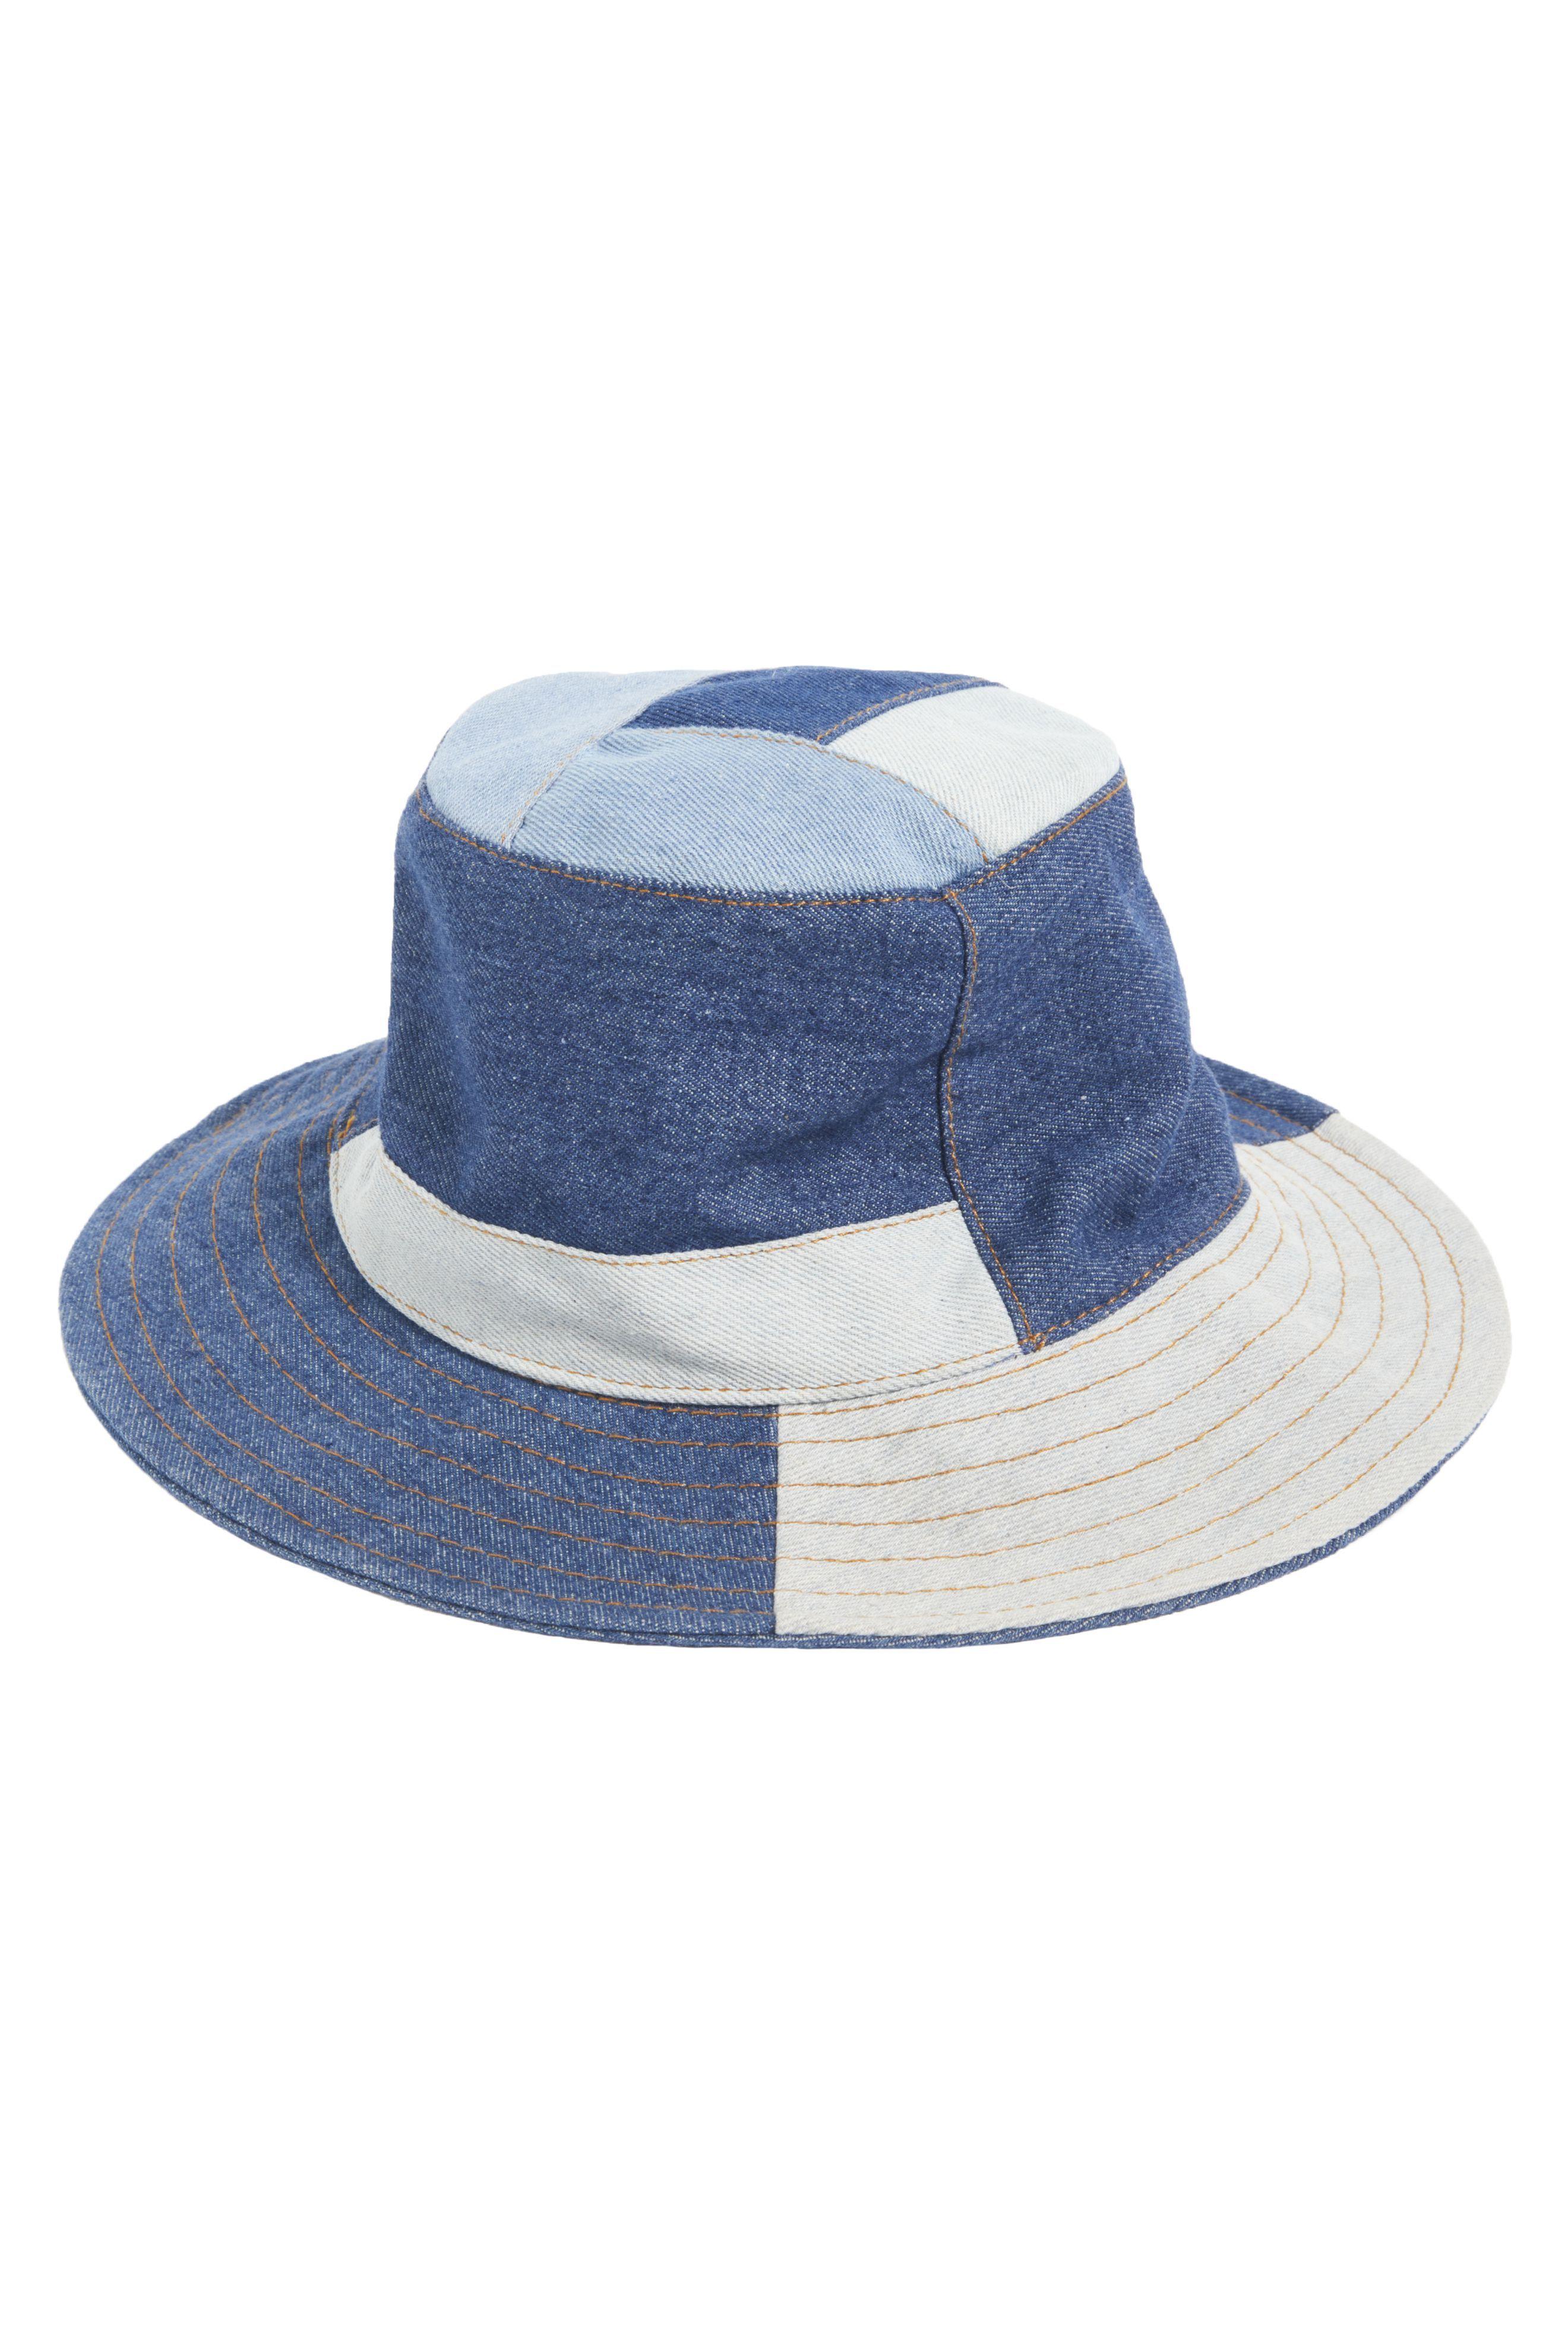 9e98943d9d4bfe 12 Stylish Bucket Hats for 2019 - Best Bucket Hats for Women